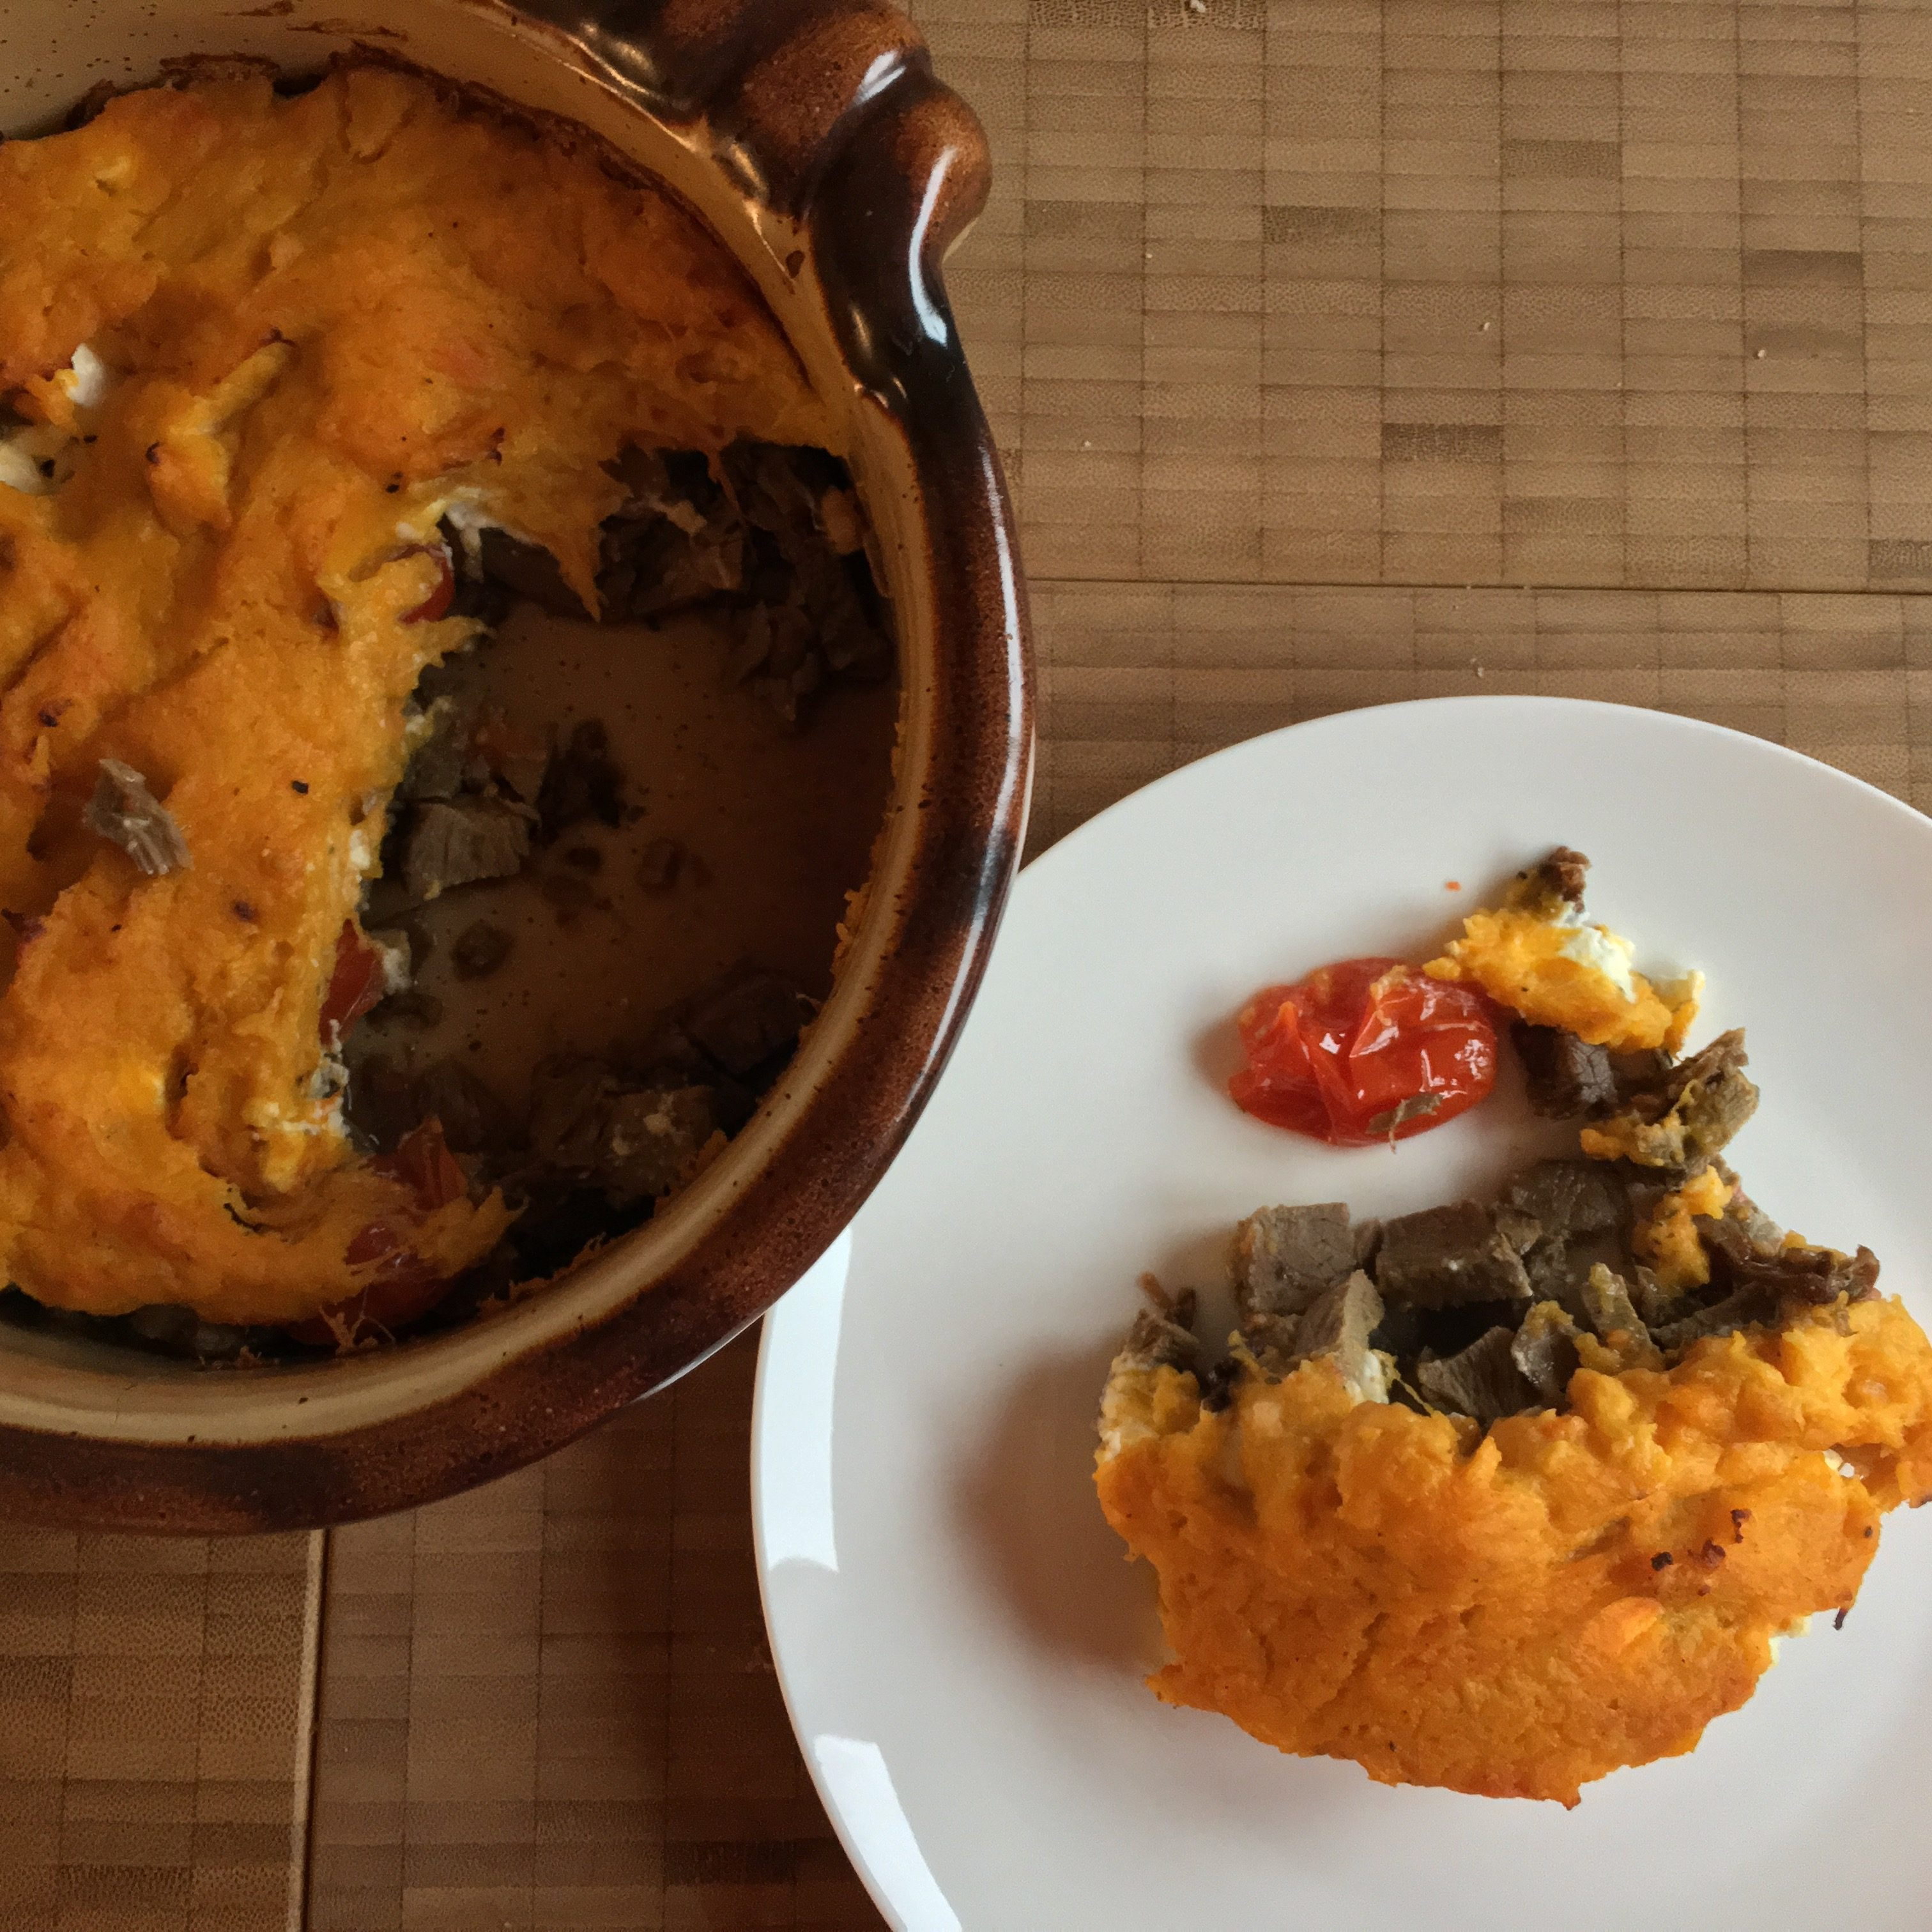 butternut - püriert & gebacken mit lammfleischresten & feta